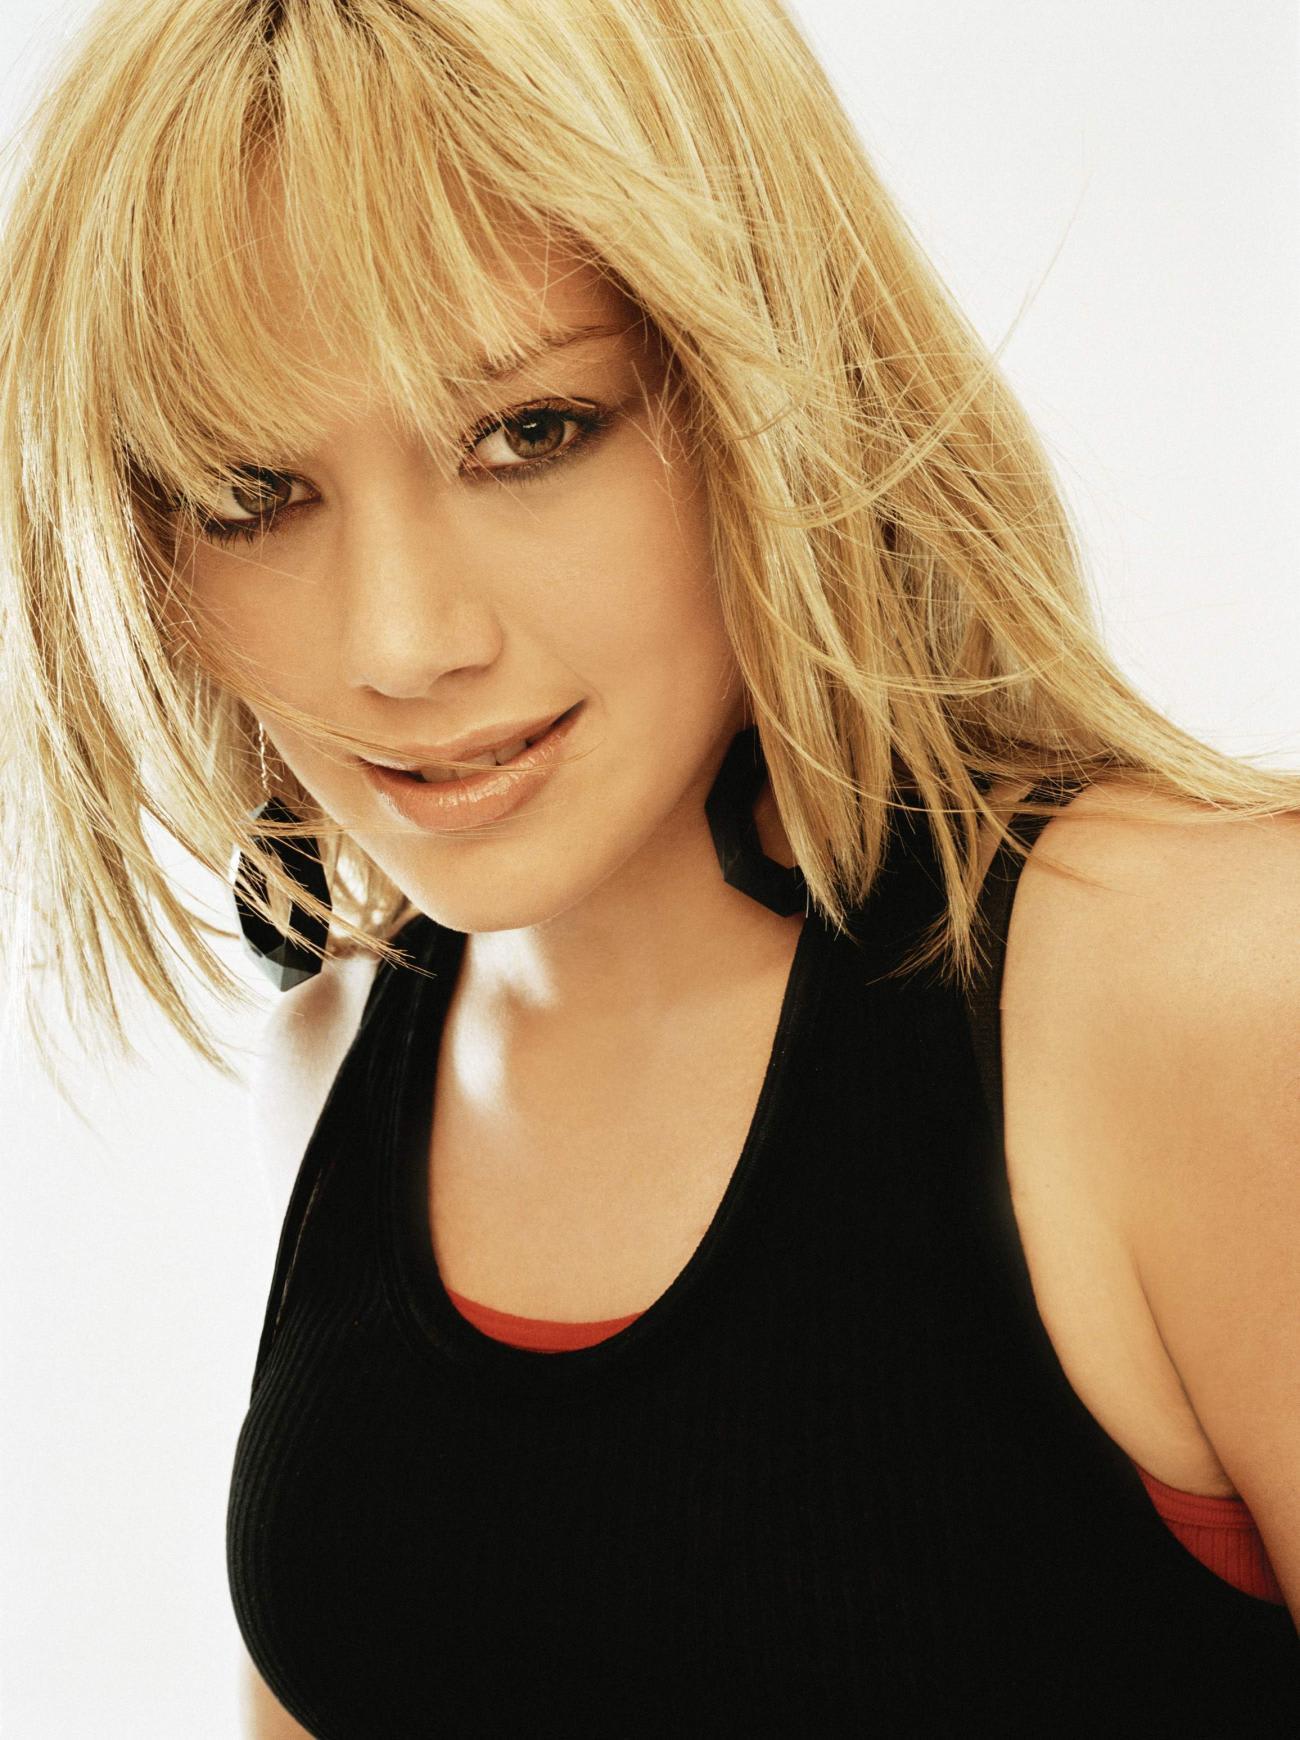 Hilary Duff - Photosho...